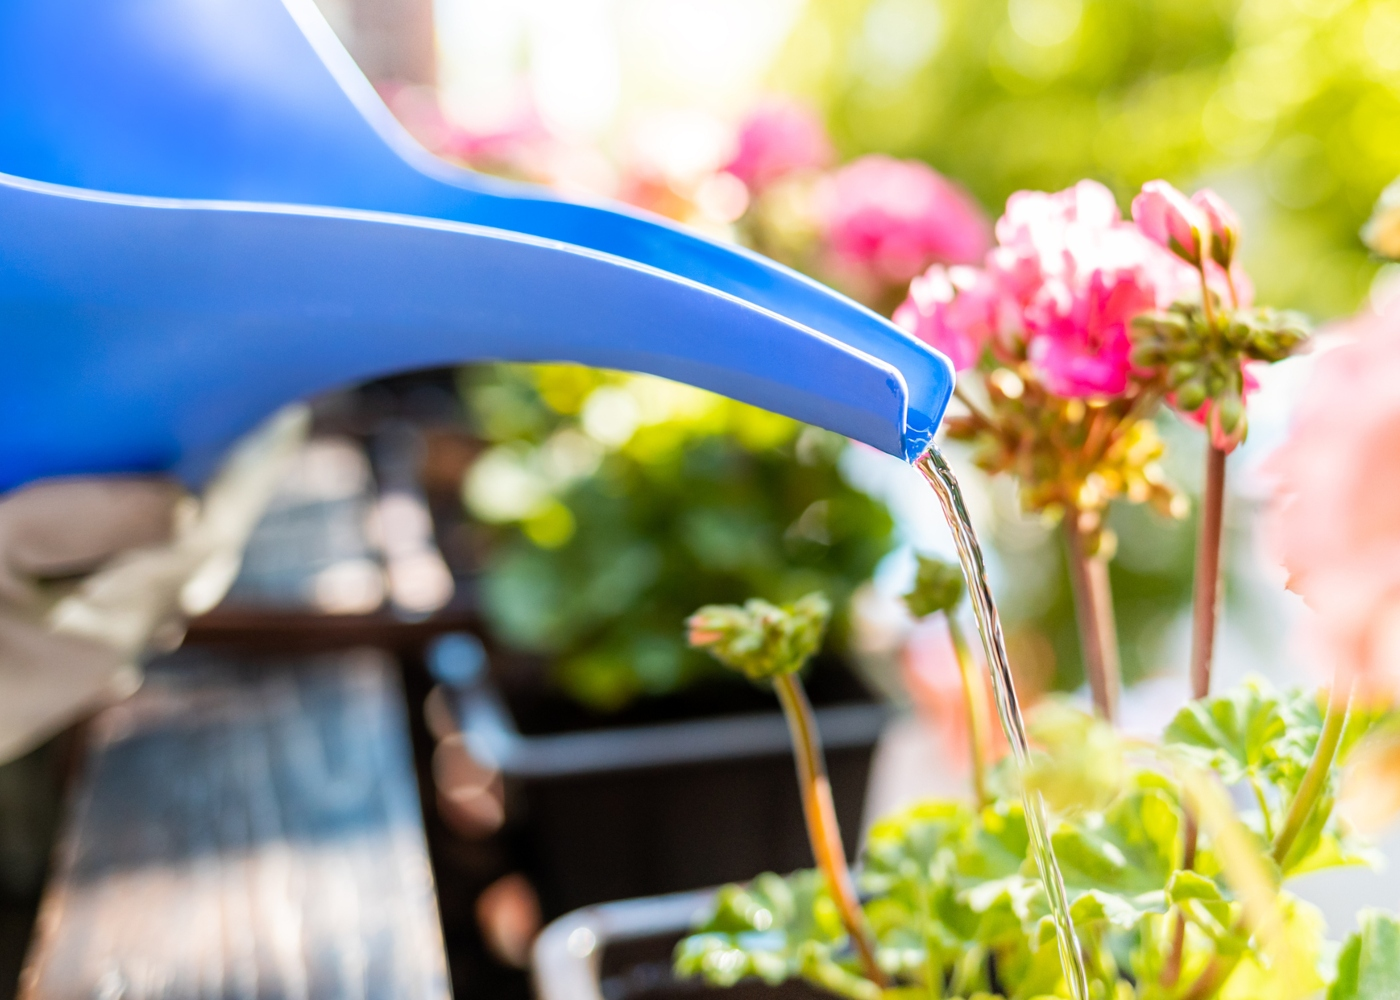 Mulher a regar plantas na varanda